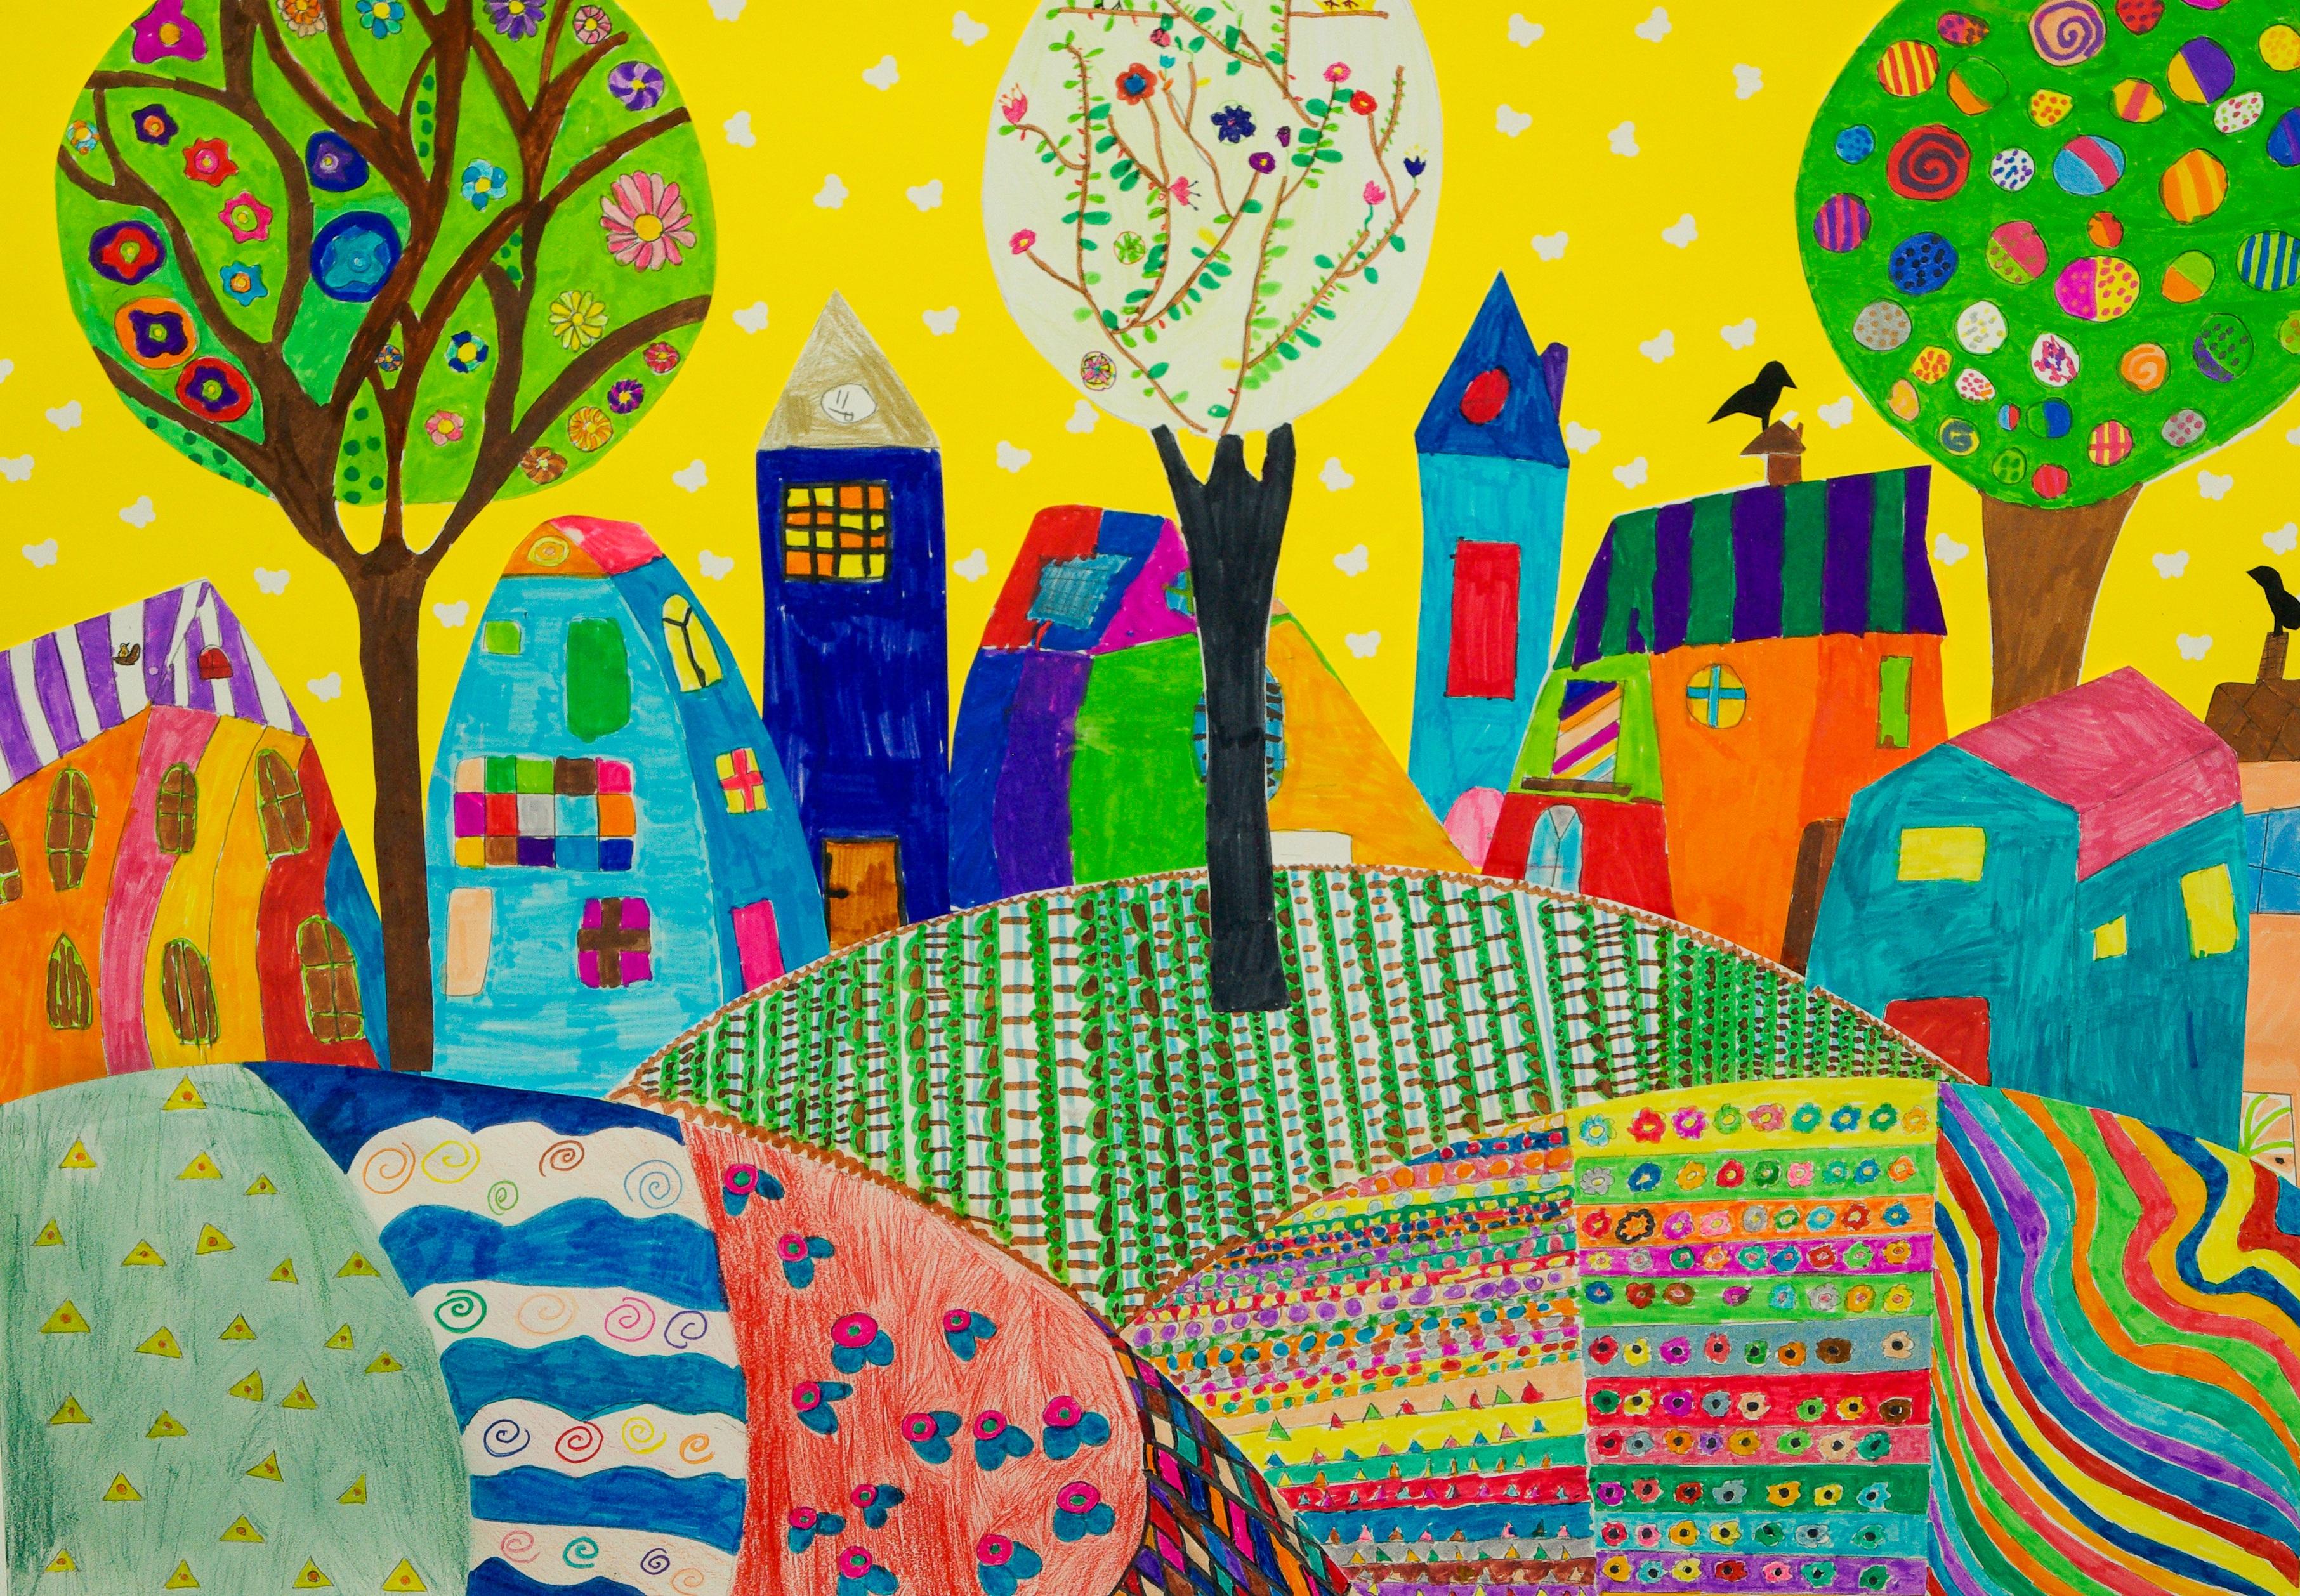 Free images table village pattern color garden for Children s mural artist